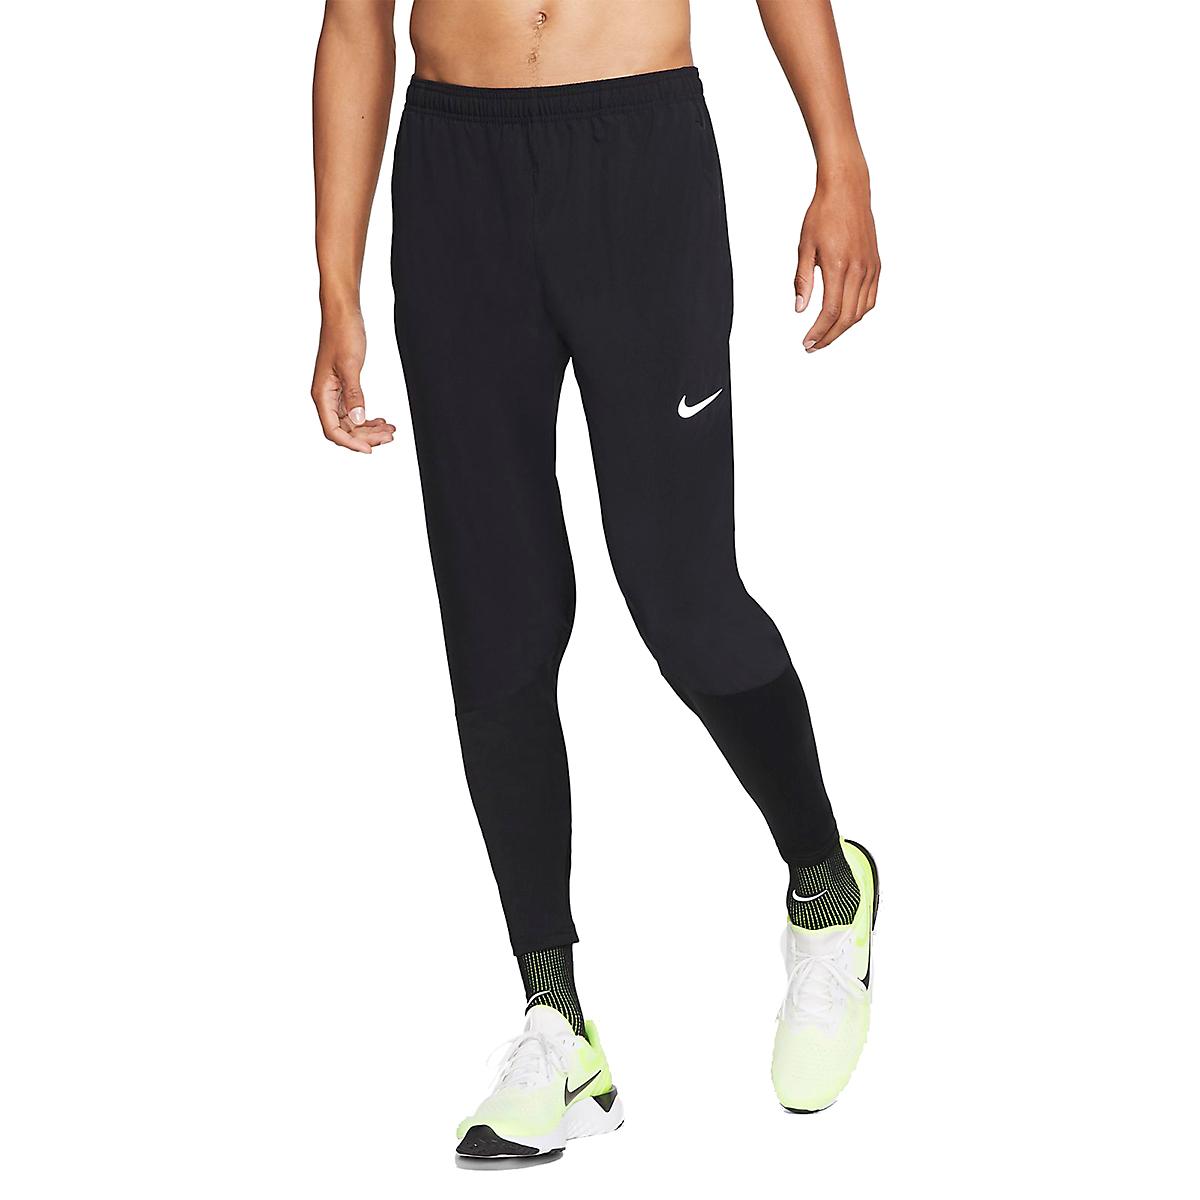 Men's Nike Phenom Essential Pant  - Color: Black/Reflective - Size: S, Black/Reflective, large, image 1